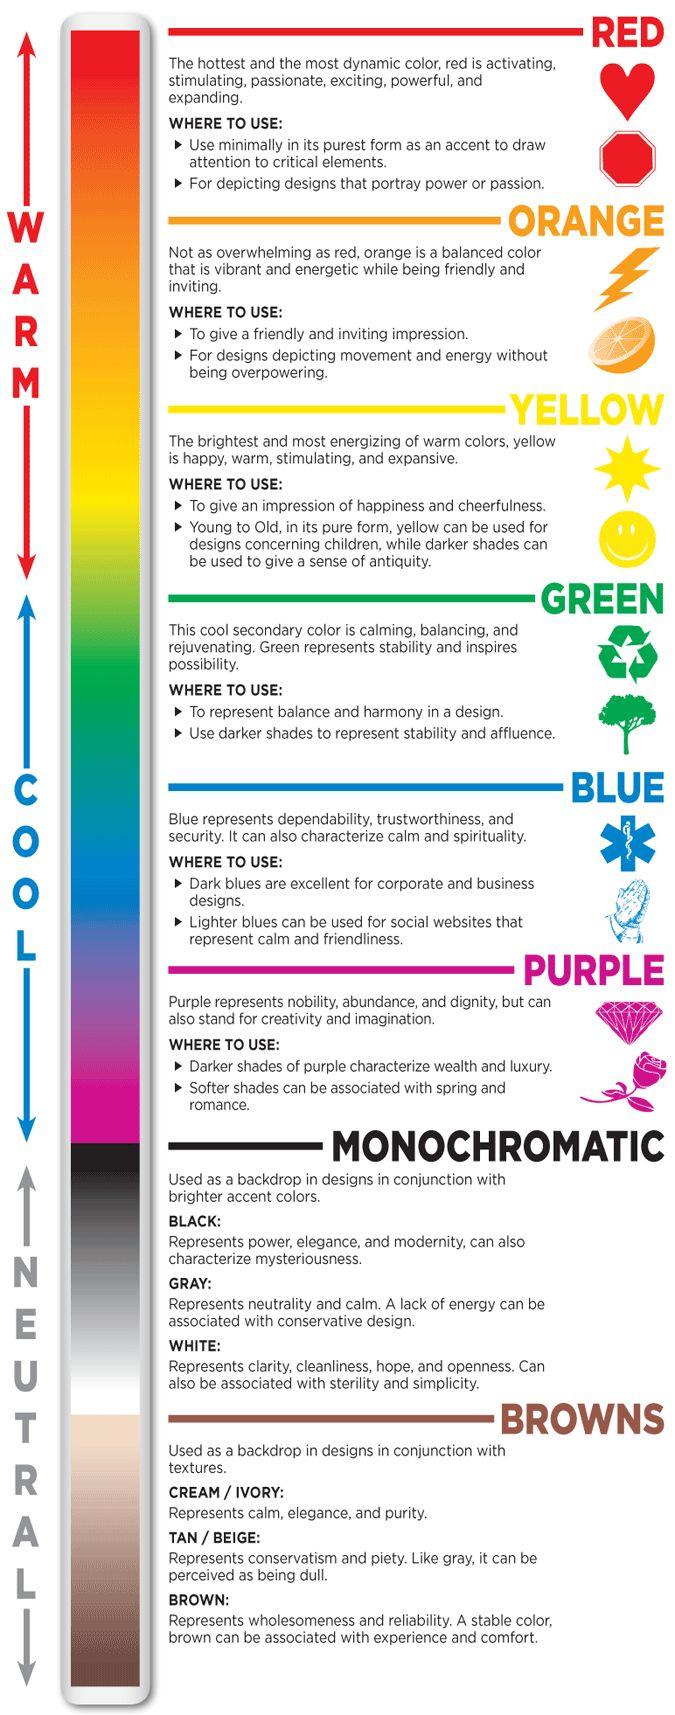 The Psychology of Color in Design       tjn